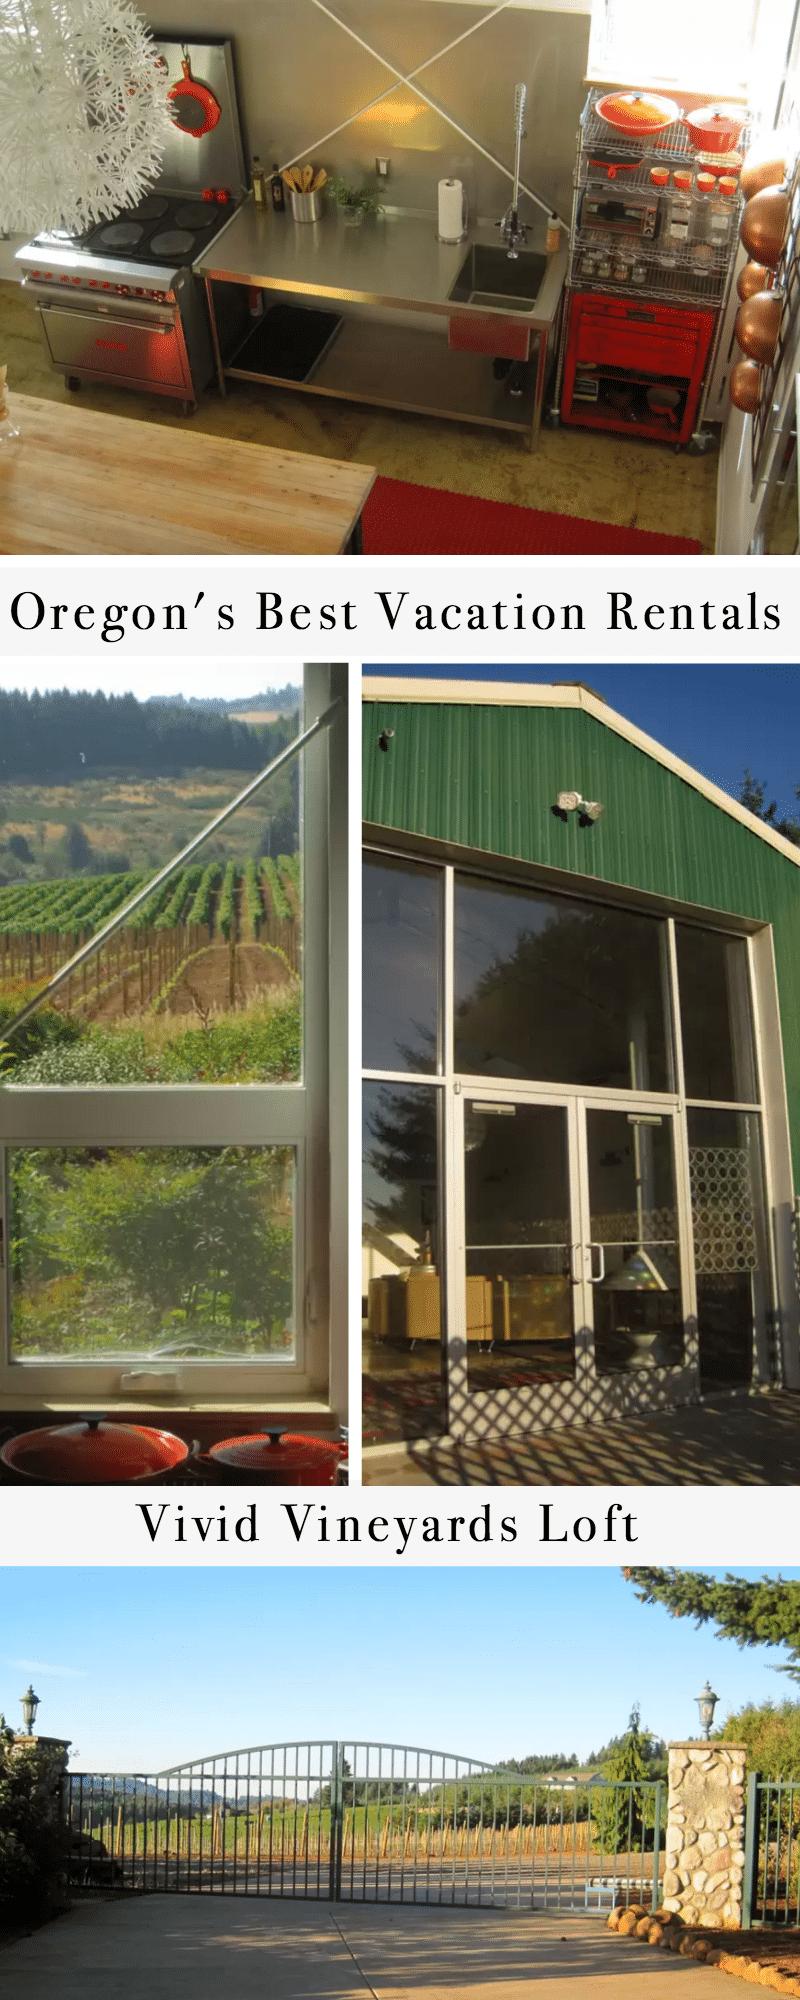 Oregon's Best Vacation Rentals: Vivid Vineyards Loft